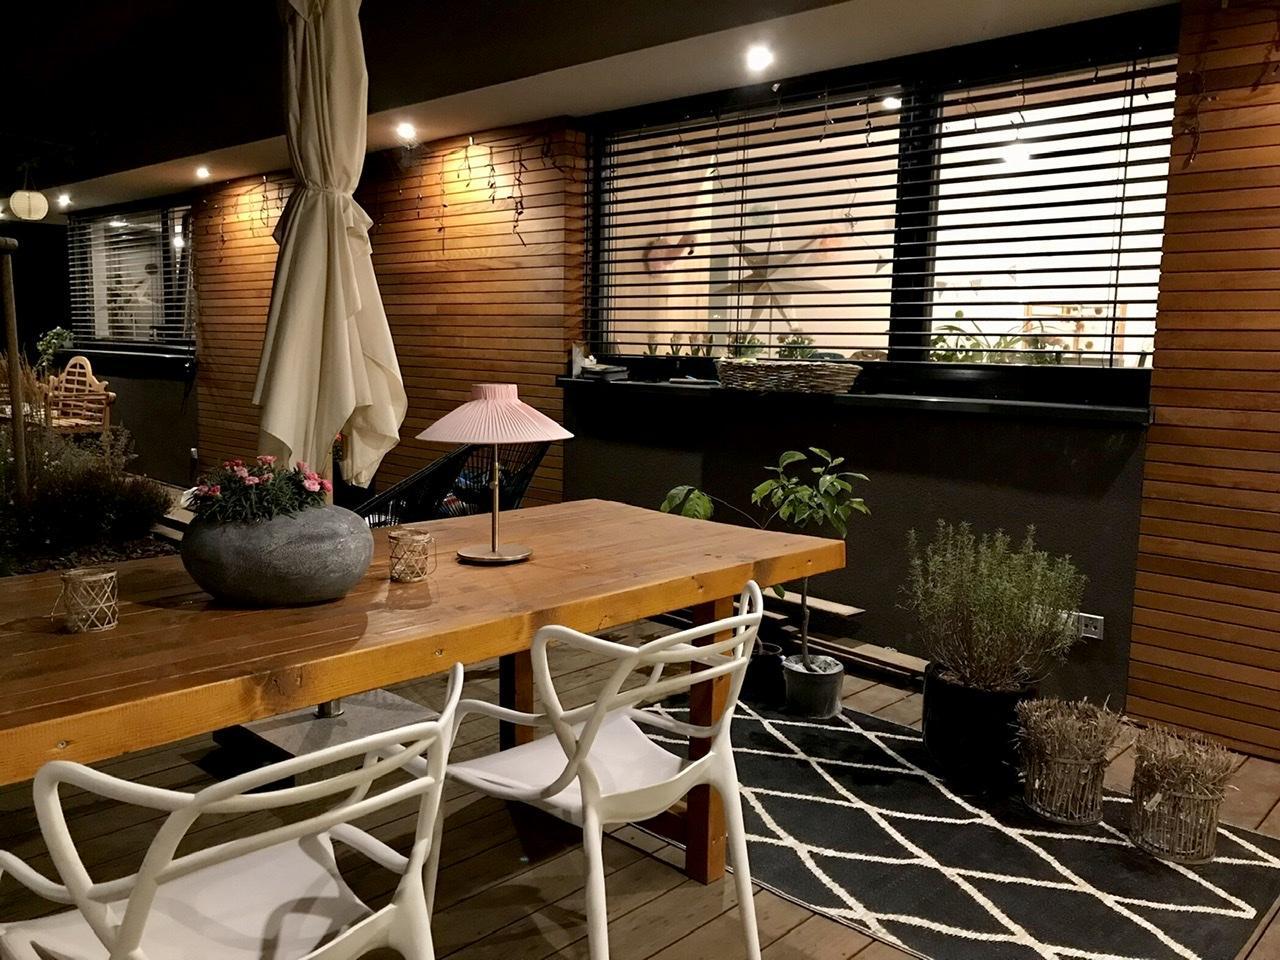 Naše L-ko - 2021 - stále dokončujeme - Večer na terase